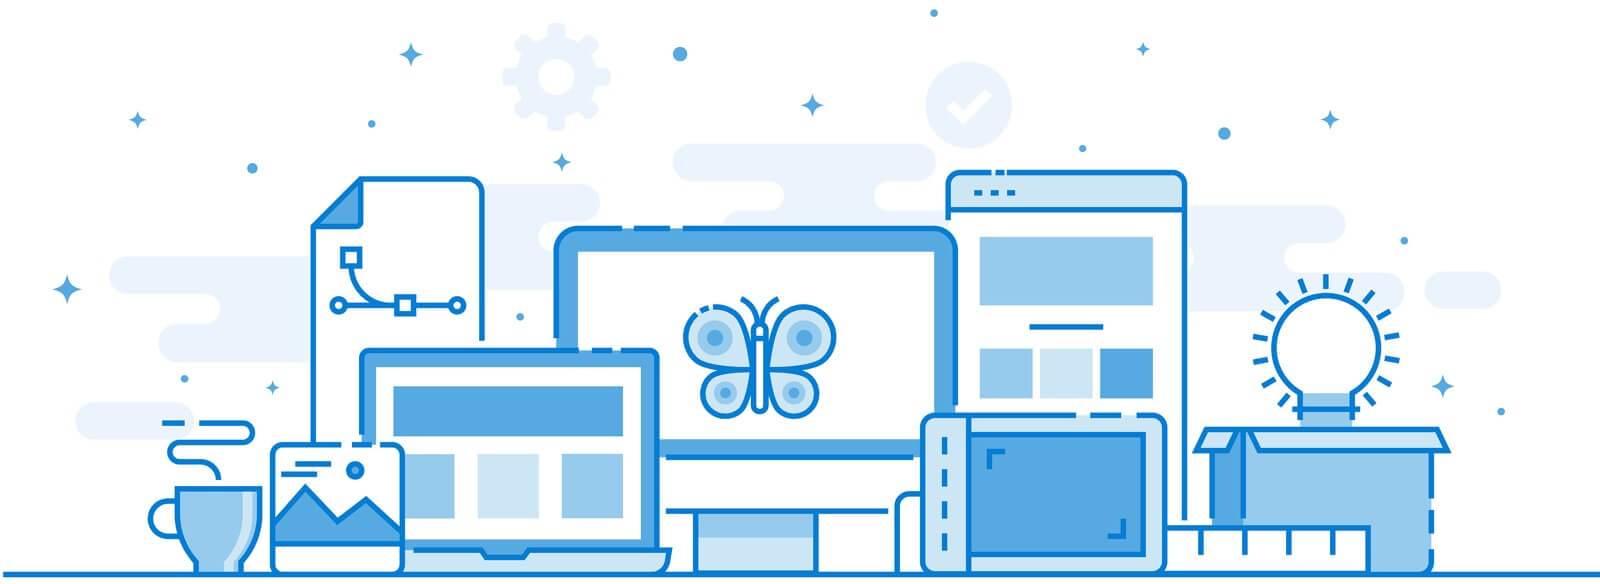 Yotec - custom software development house: WEB and MOBILE